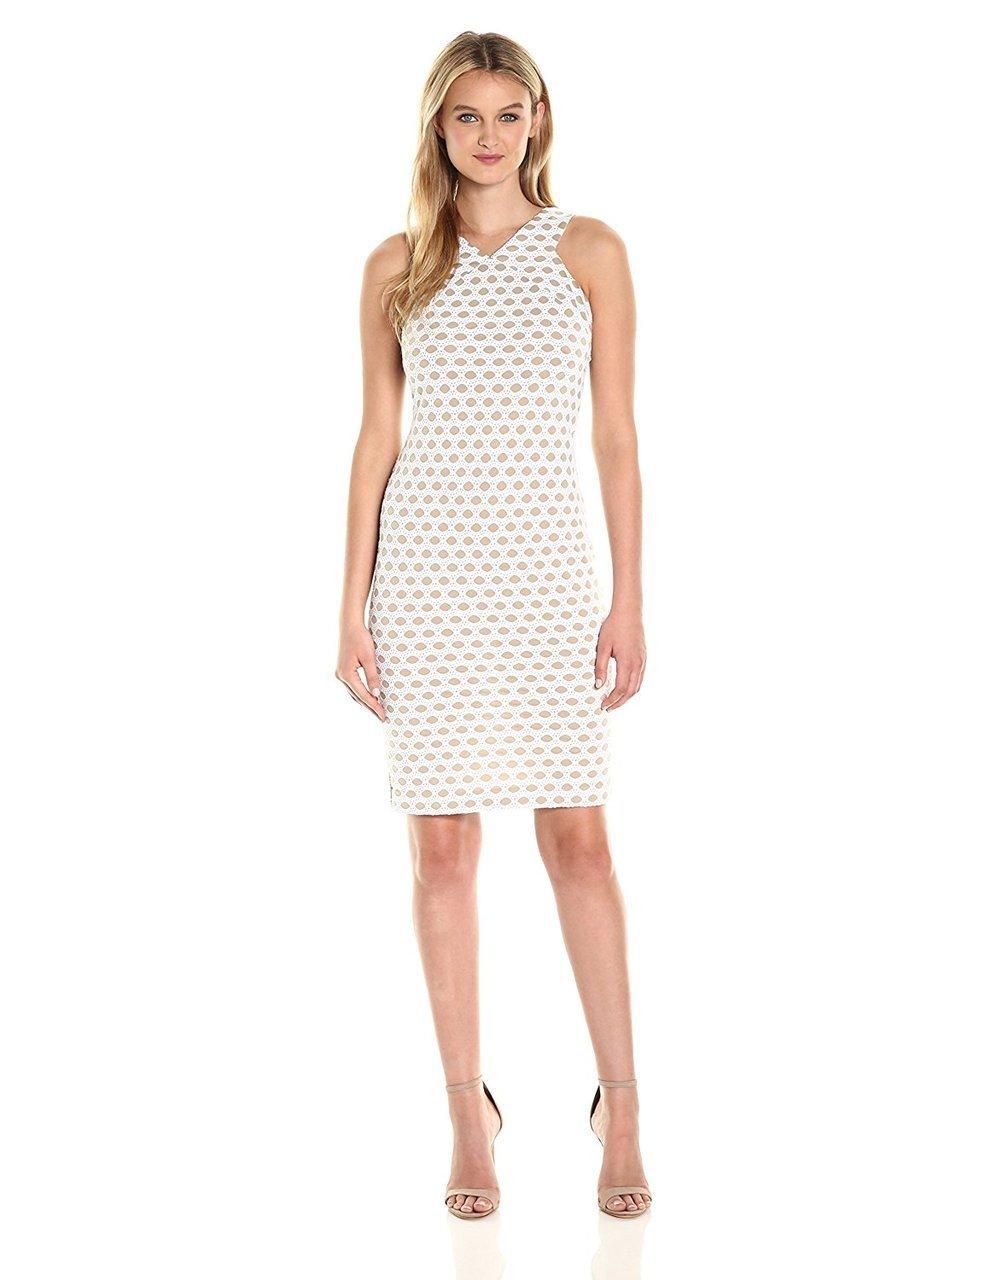 Taylor - 8892M Crochet Knit Sheath Dress